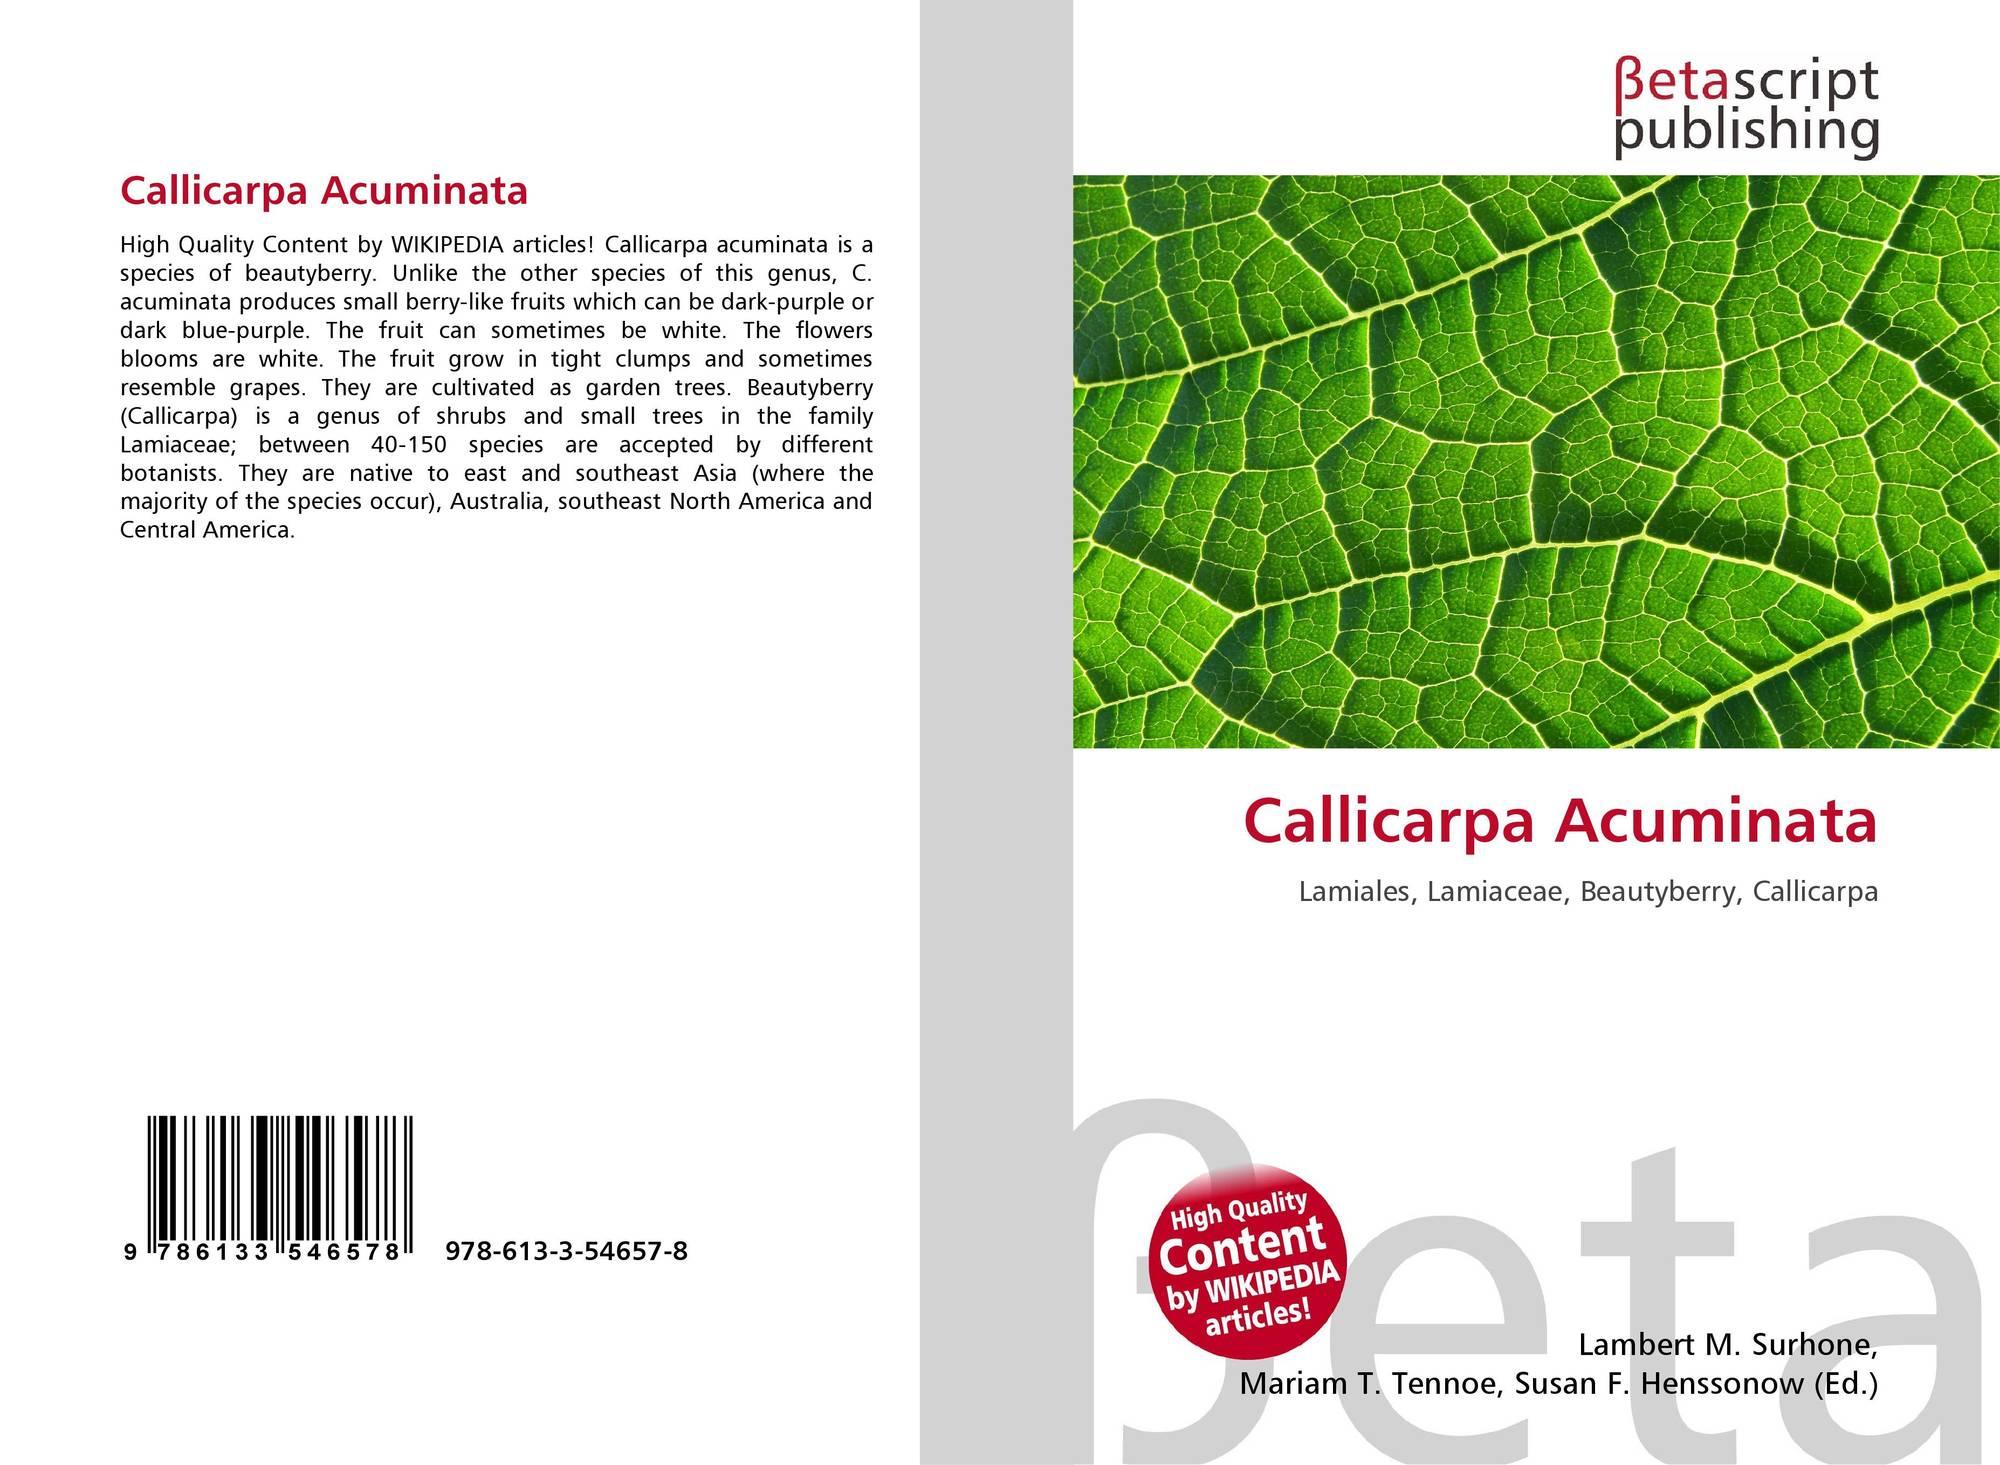 condylomata acuminata behandlung)